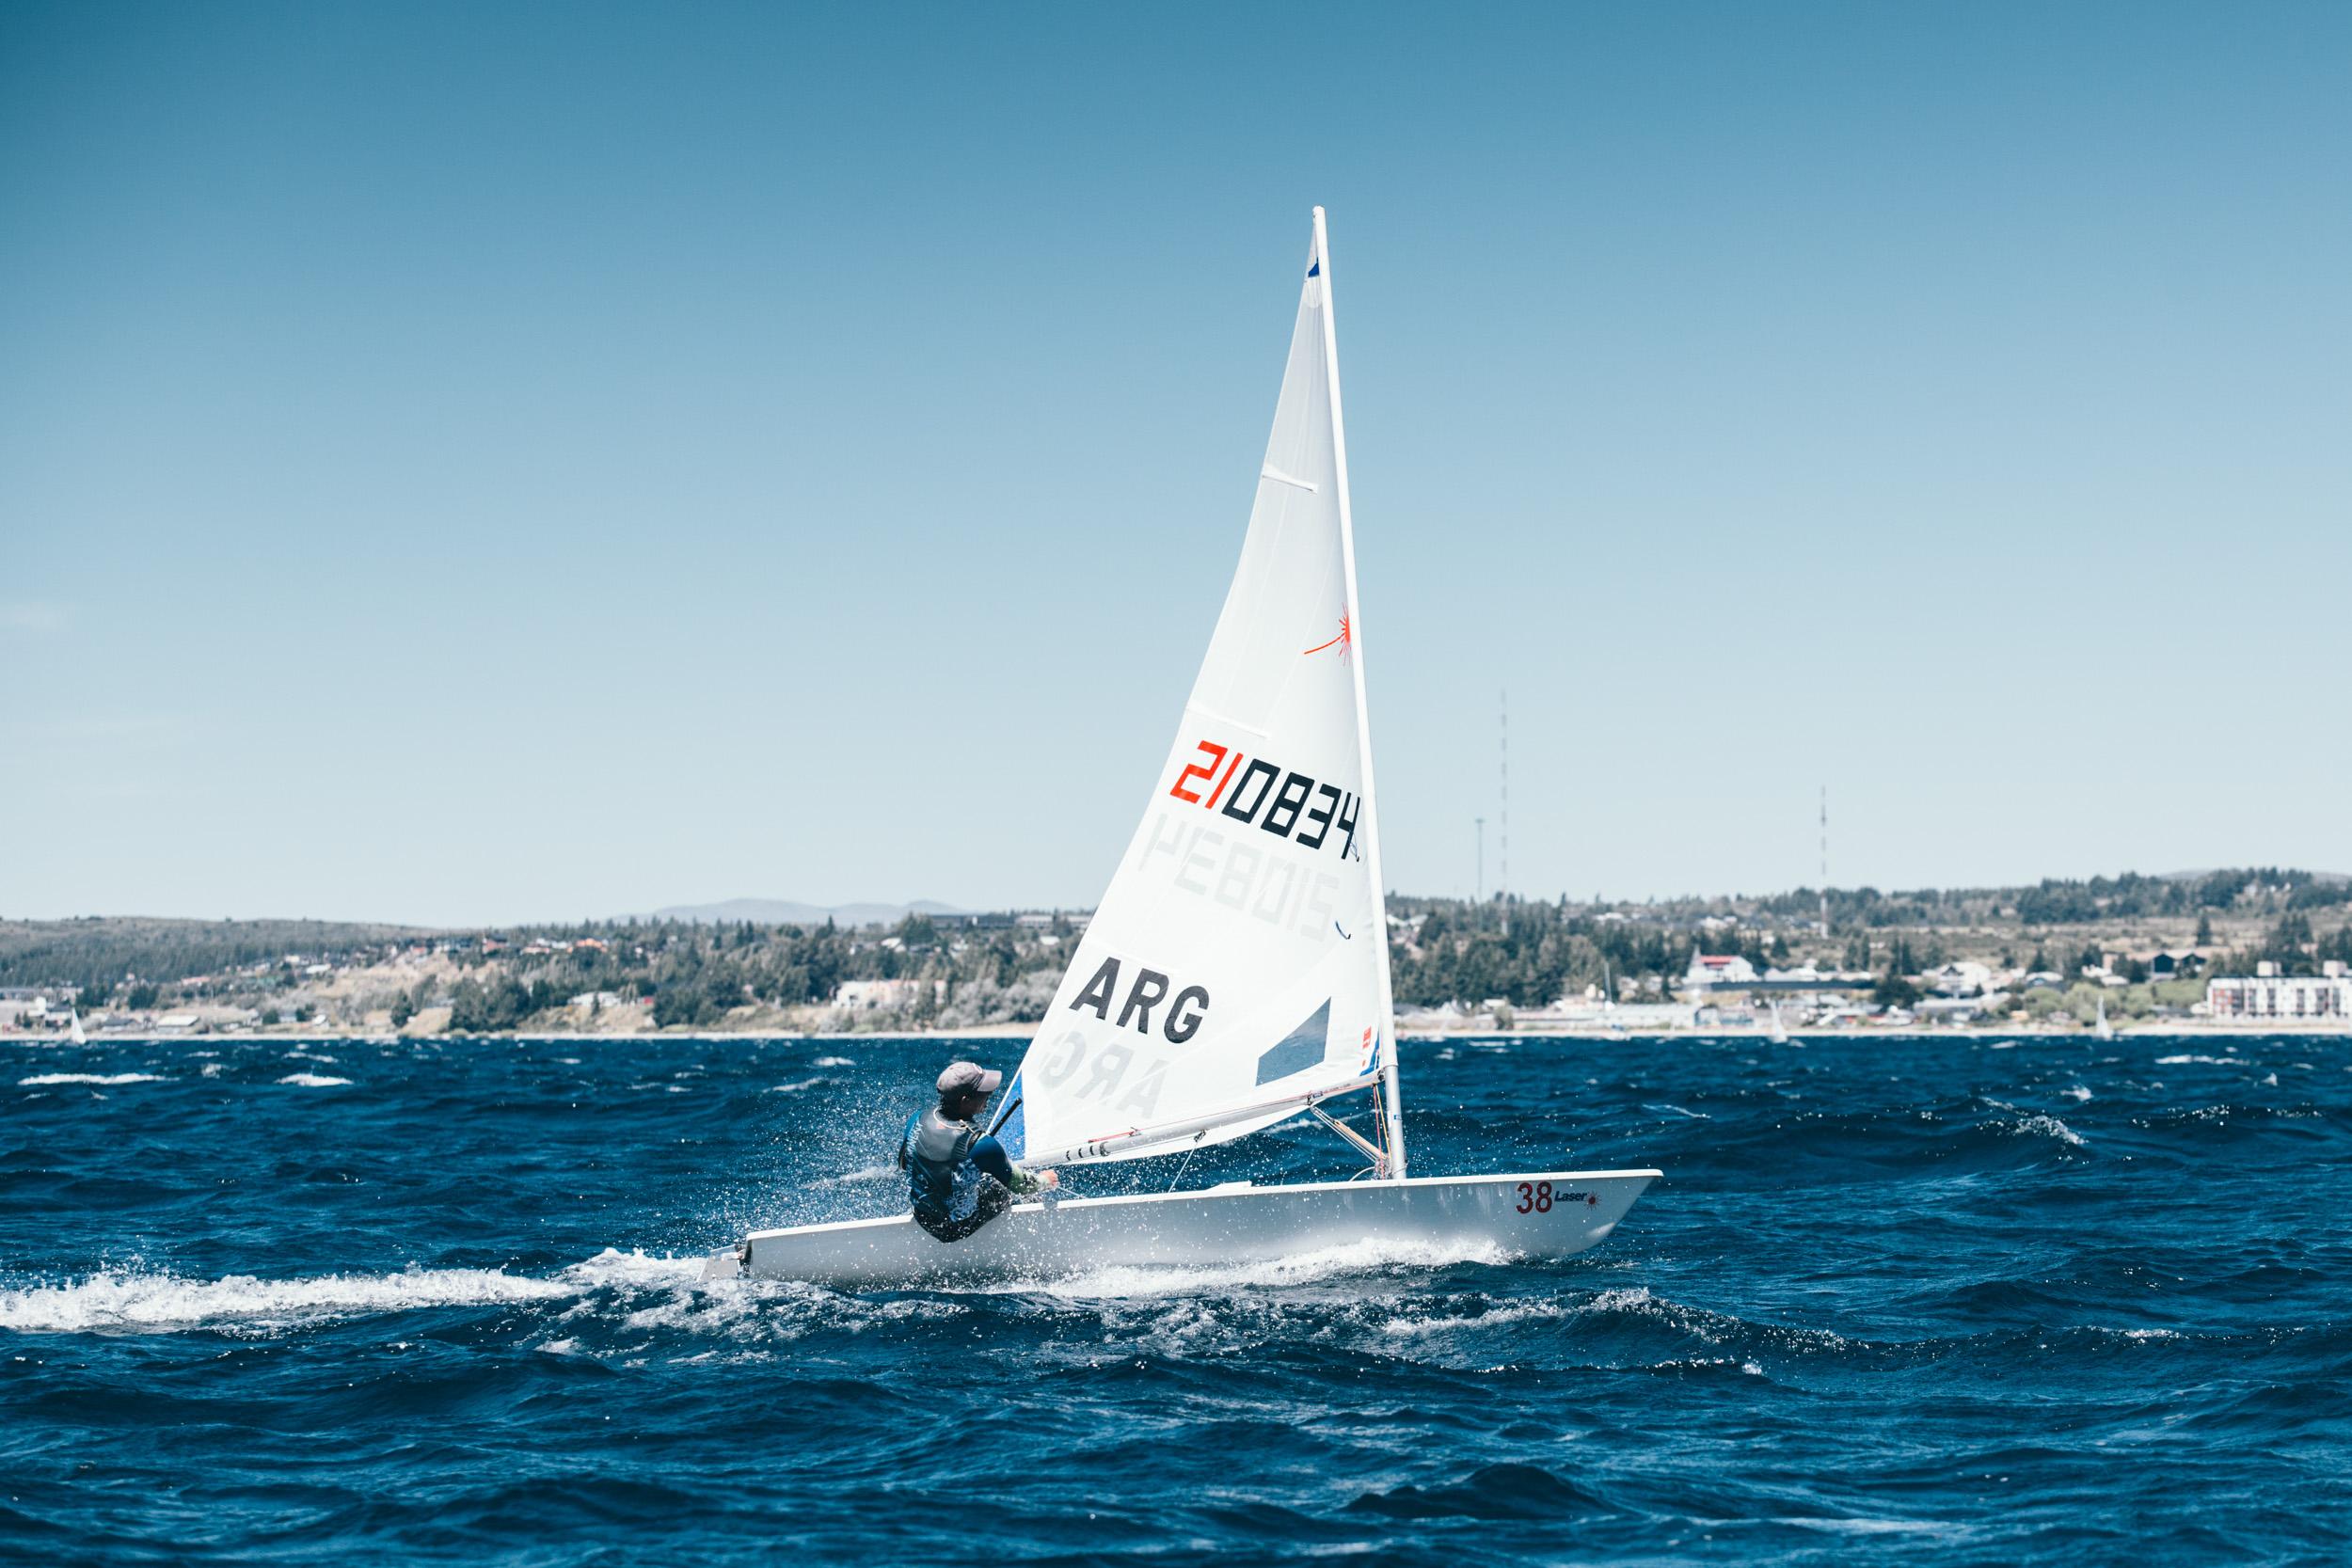 BAF2018_21 ARG Laser 2018_1-445.jpg